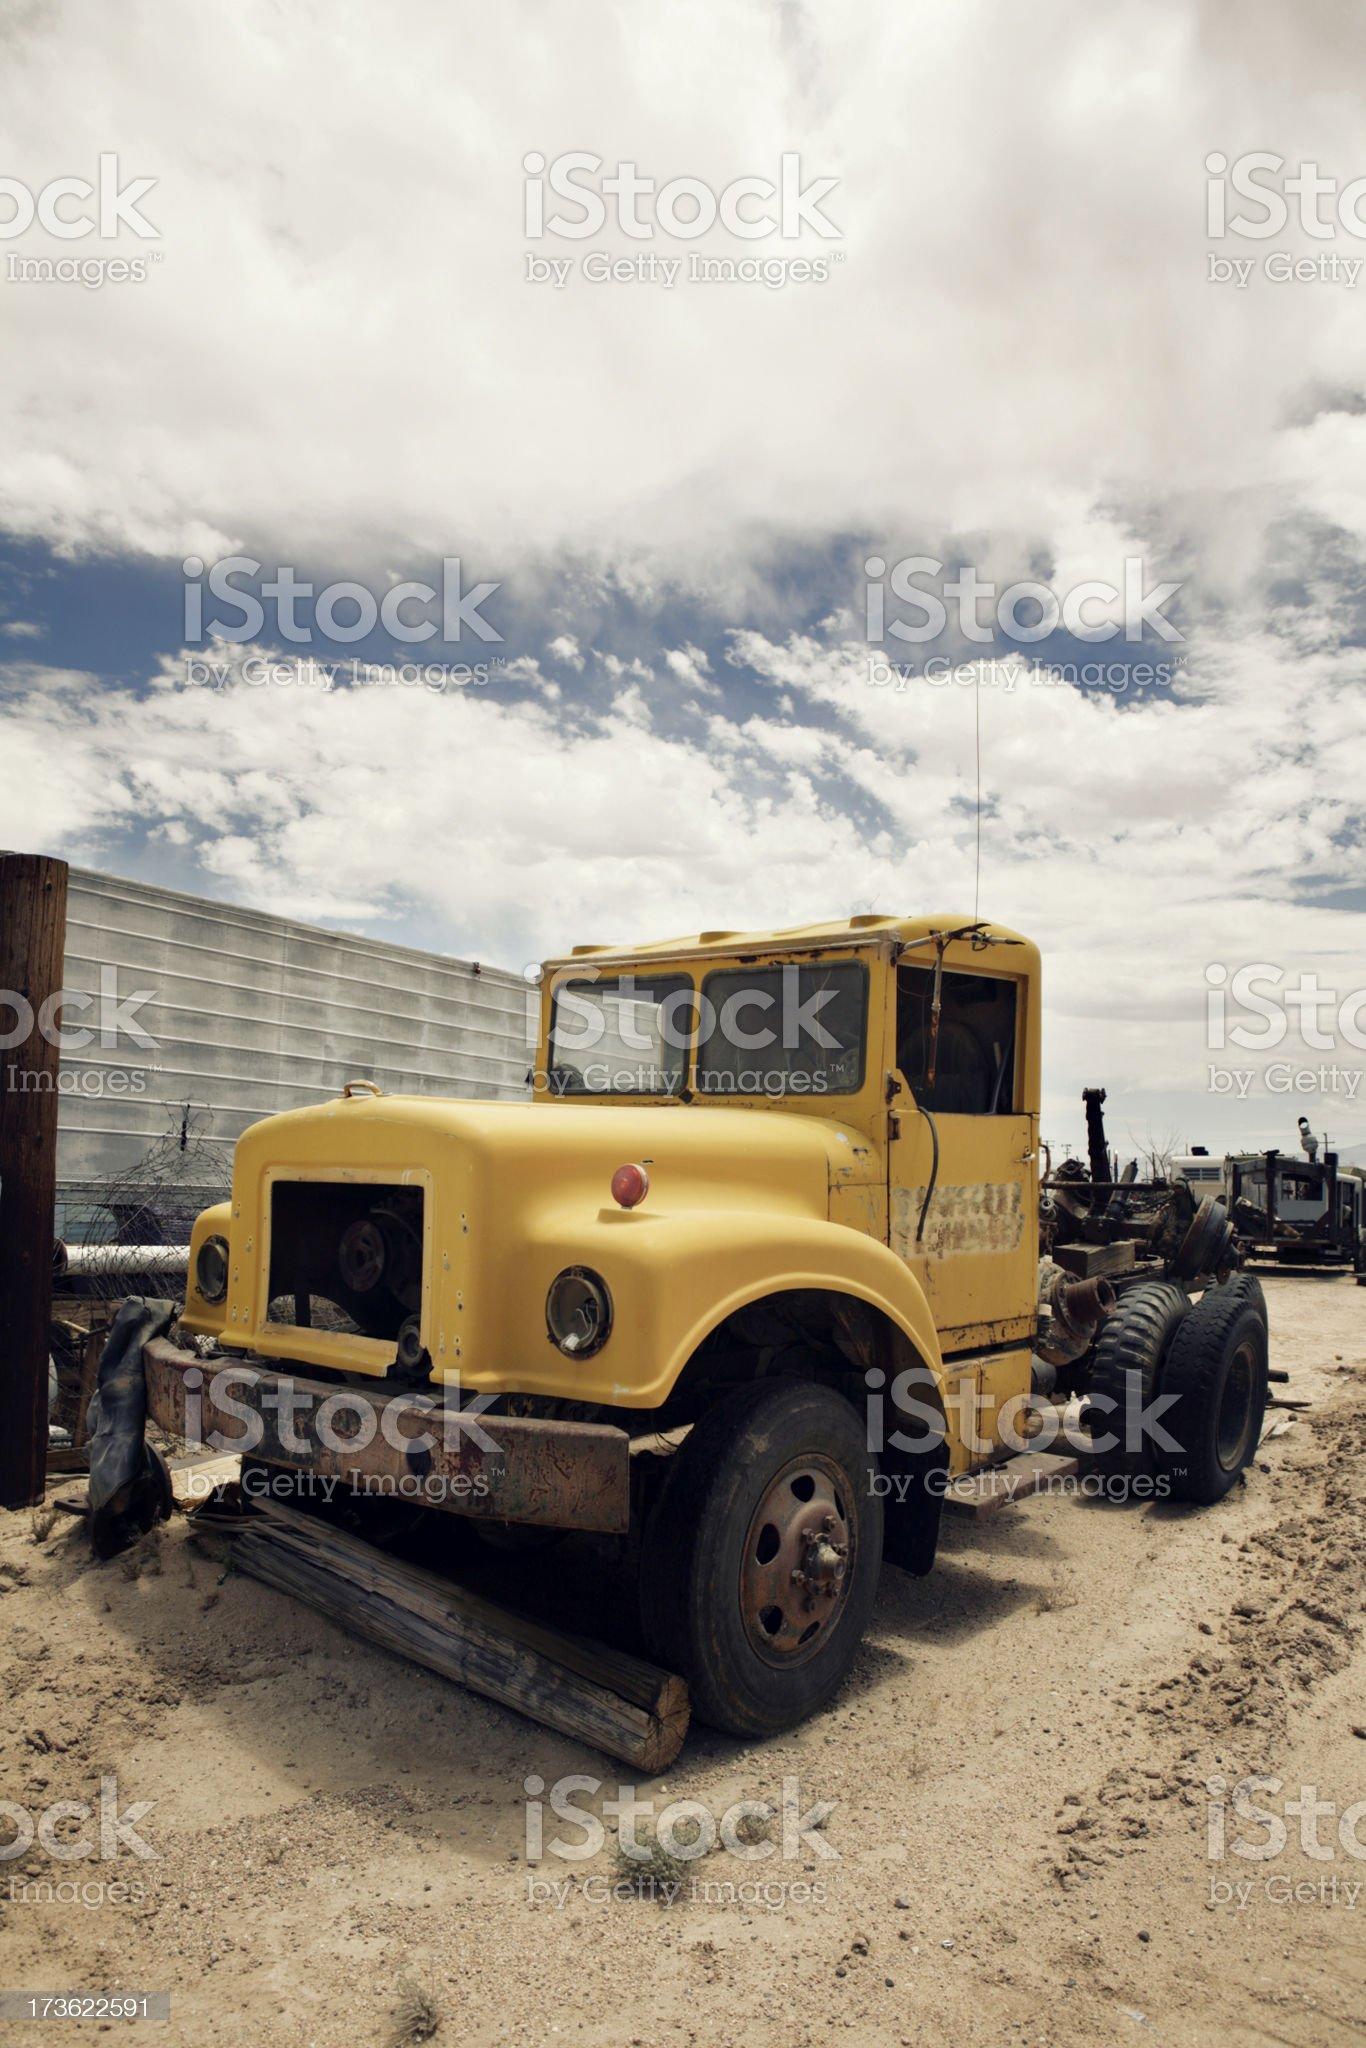 Vintage hauling truck royalty-free stock photo